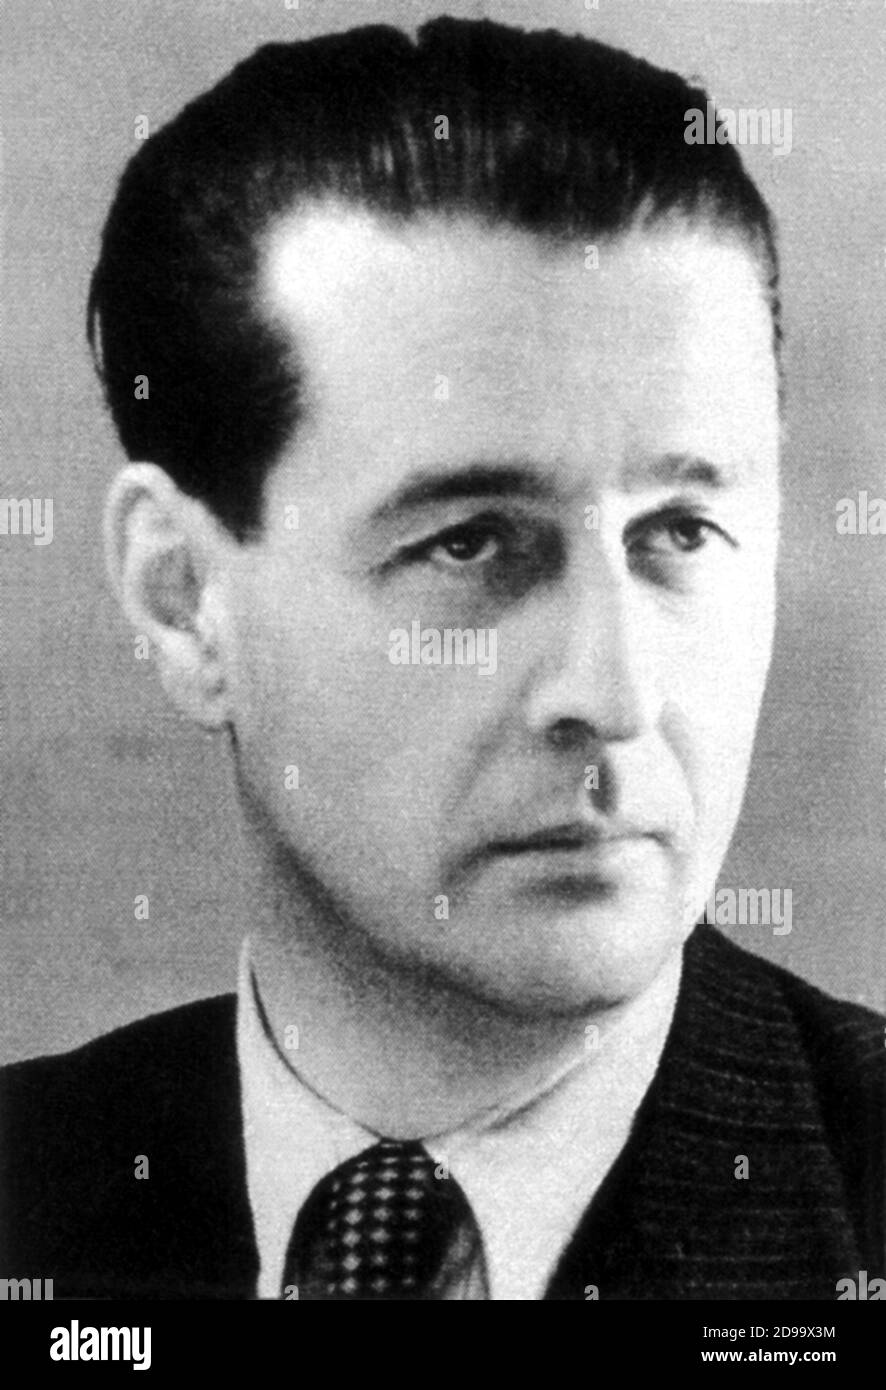 The catholic  italian hero ,  anti nazi jewish Holocaust , GIORGIO  PERLASCA ( 1910 - 1992 ), from december 1944 to january 1945 like a fake spanish Ambassador in Budapest ( Hungary ) save the life to 5218 hungarian jewish - EROE - PERSECUZIONI EBRAICHE - persecuzione ebraica - OLOCAUSTO - ebreo - ebraismo - sterminio ebraico - SECONDA GUERRA MONDIALE - WWII  --- Archivio GBB Stock Photo